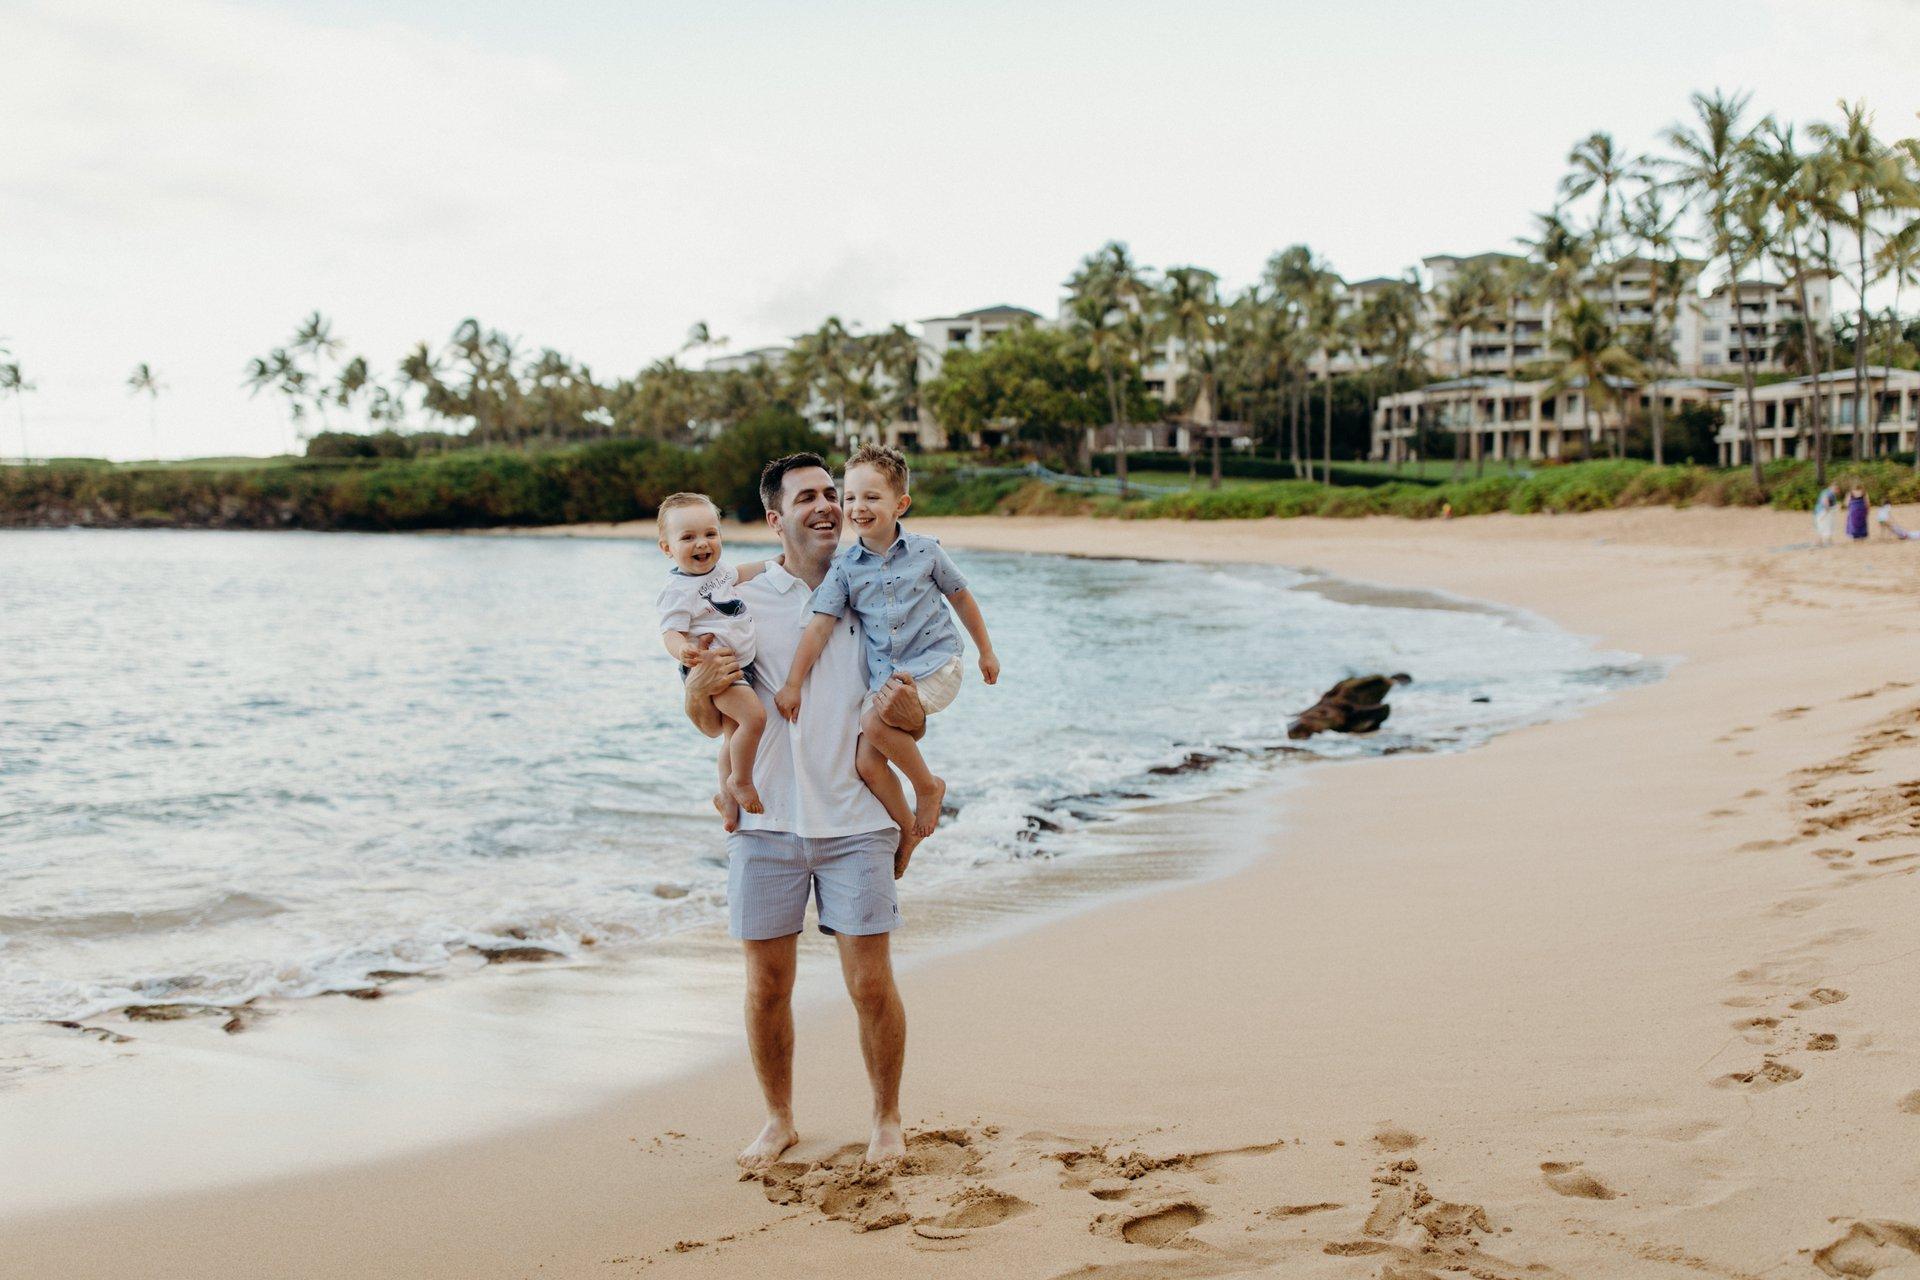 Maui-USA-travel-story-Flytographer-31